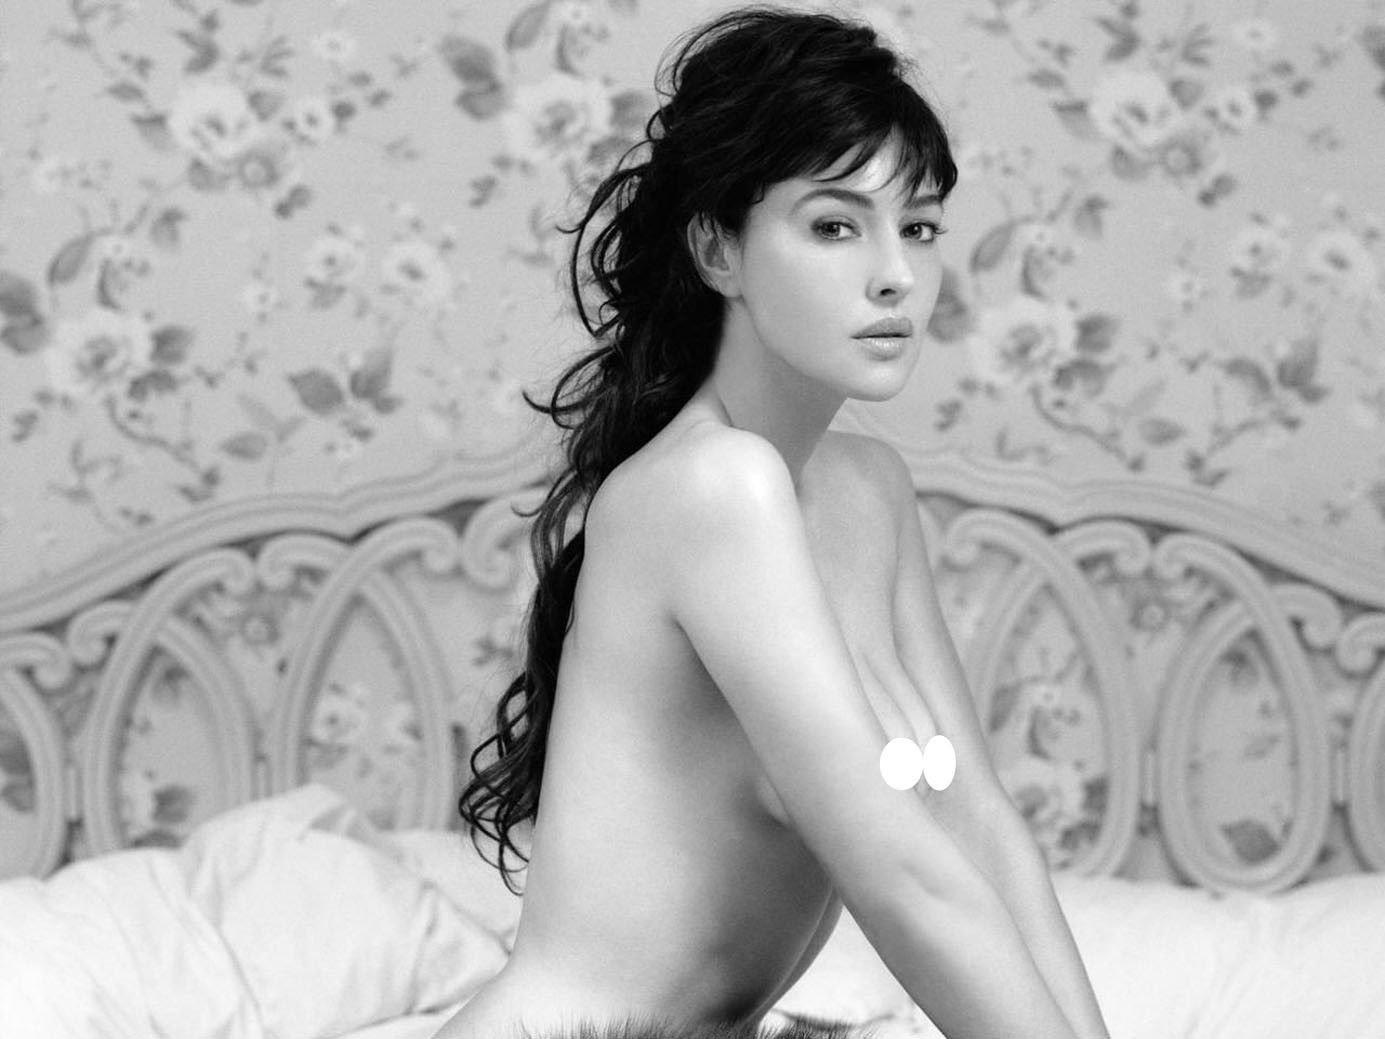 Monica Bellucci Sexy Model Wall Print POSTER Decor 32x24